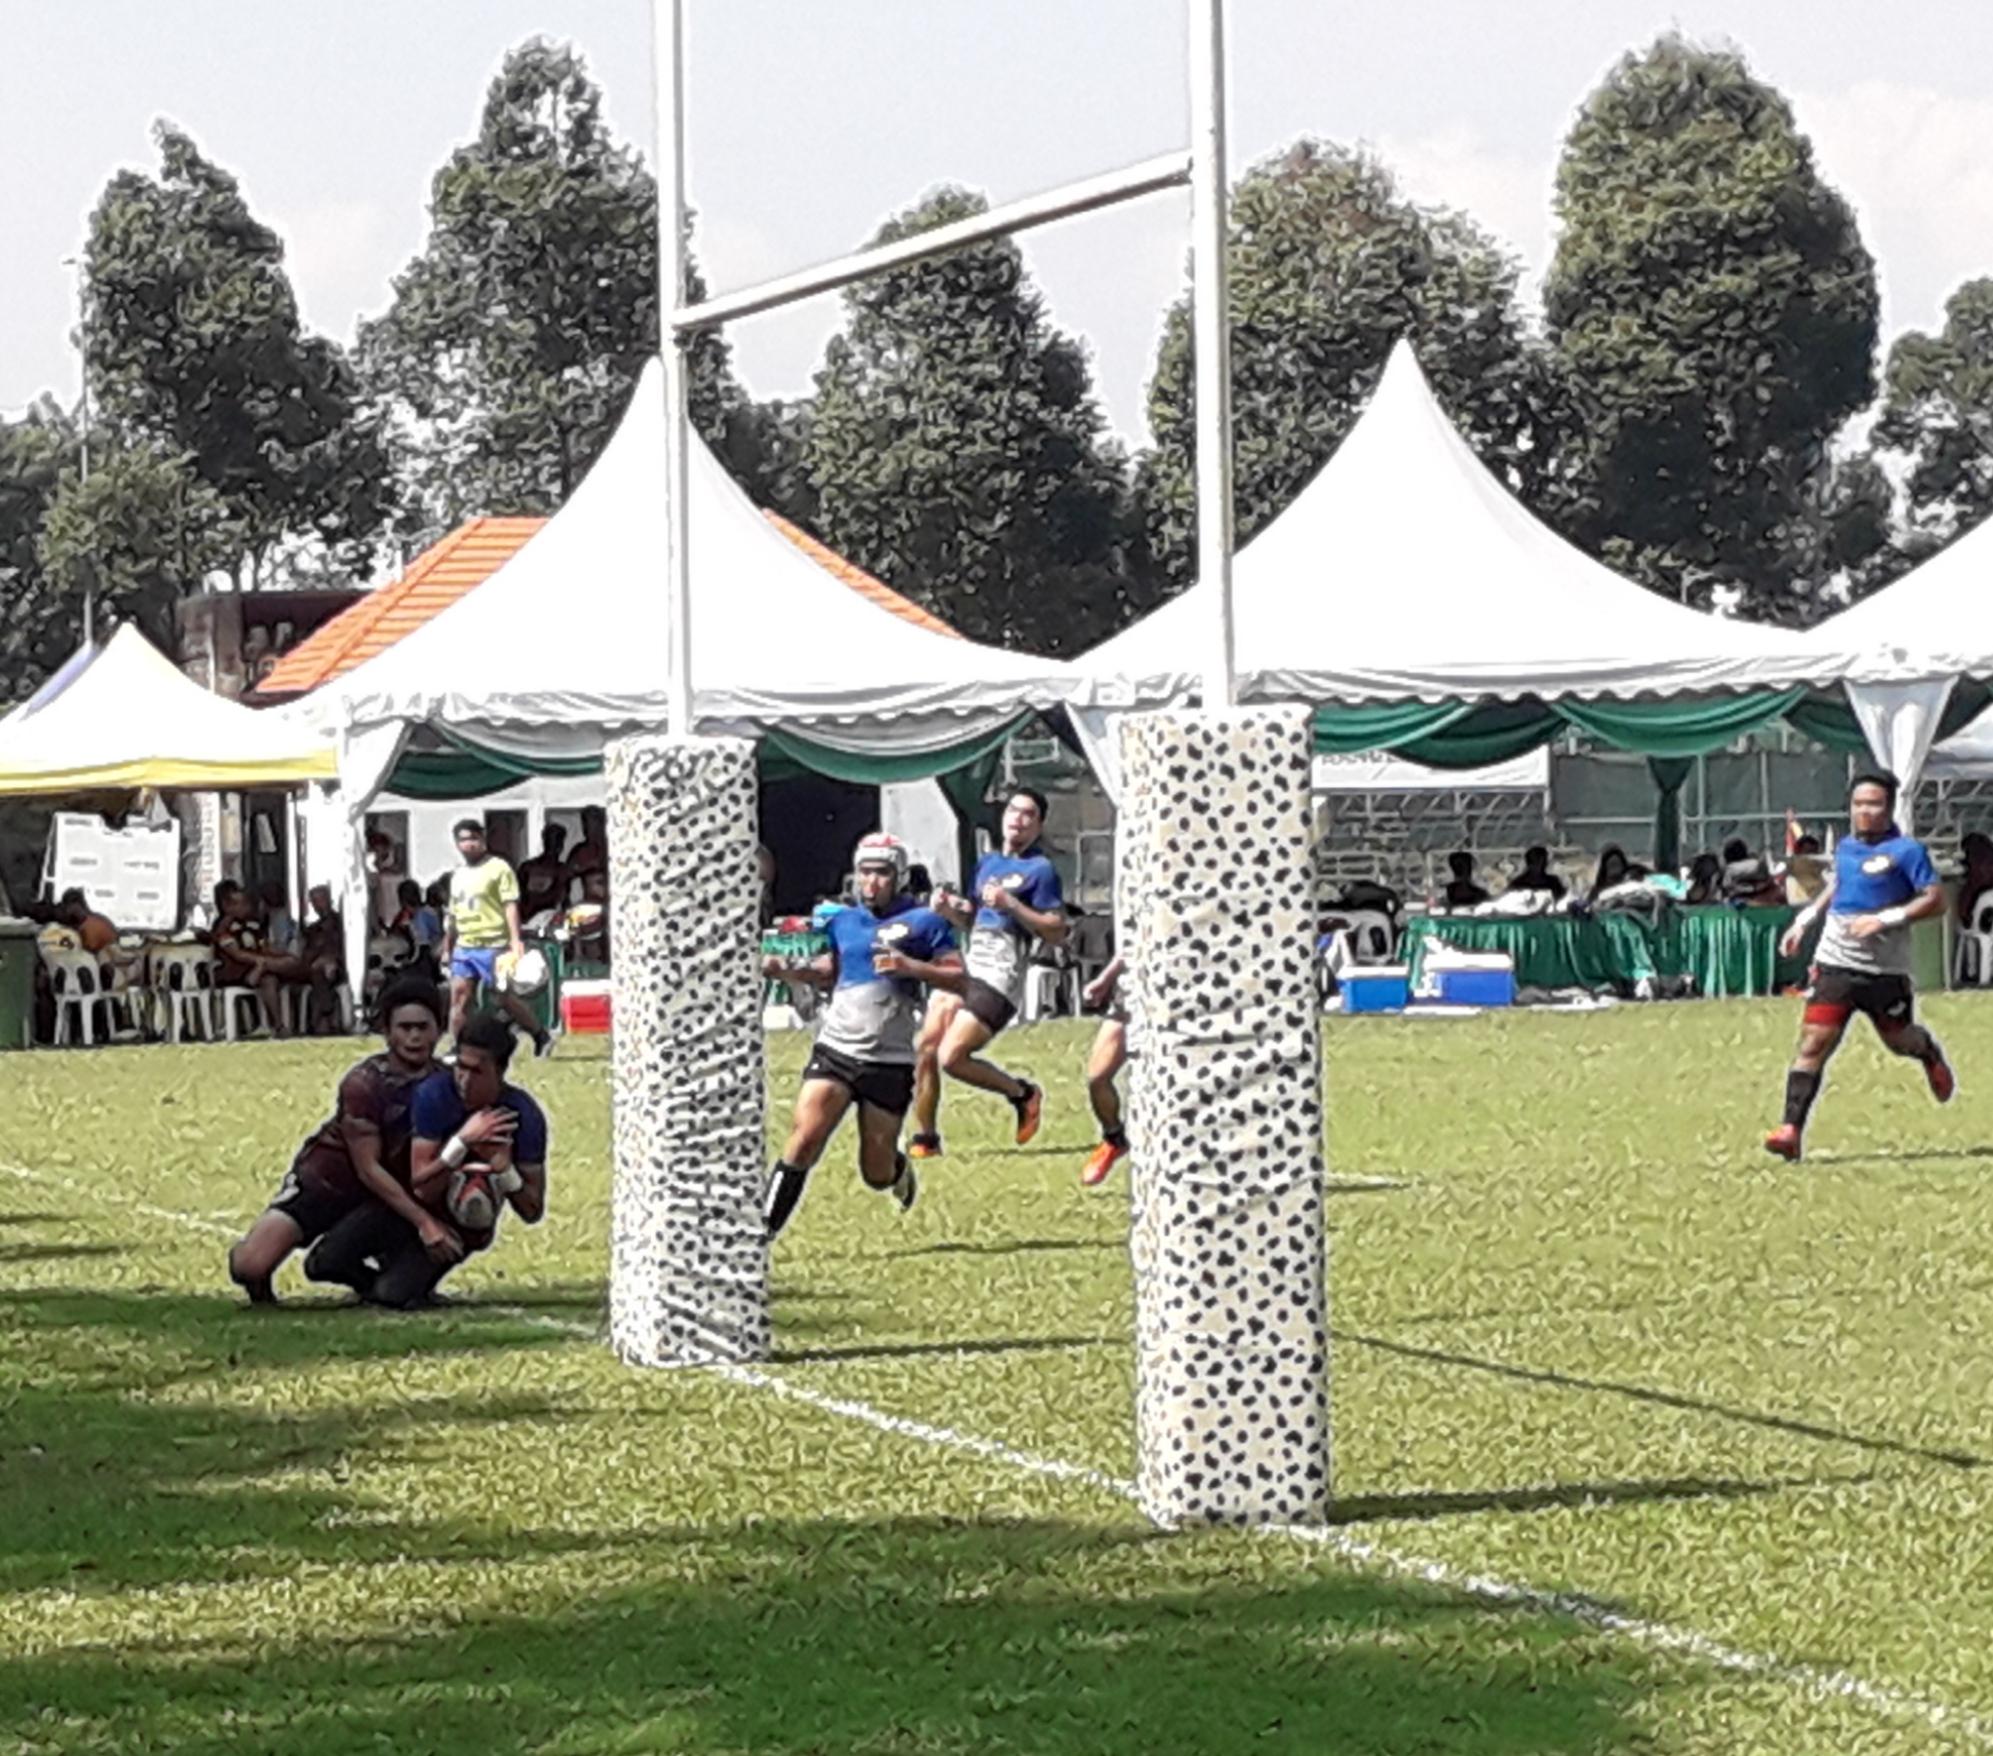 Kl Saracens Highland Games 10s Brings First Half Of The 2018 Rugby Tcash Ramadhan Milo Malaysia Activ Go 1 Nov